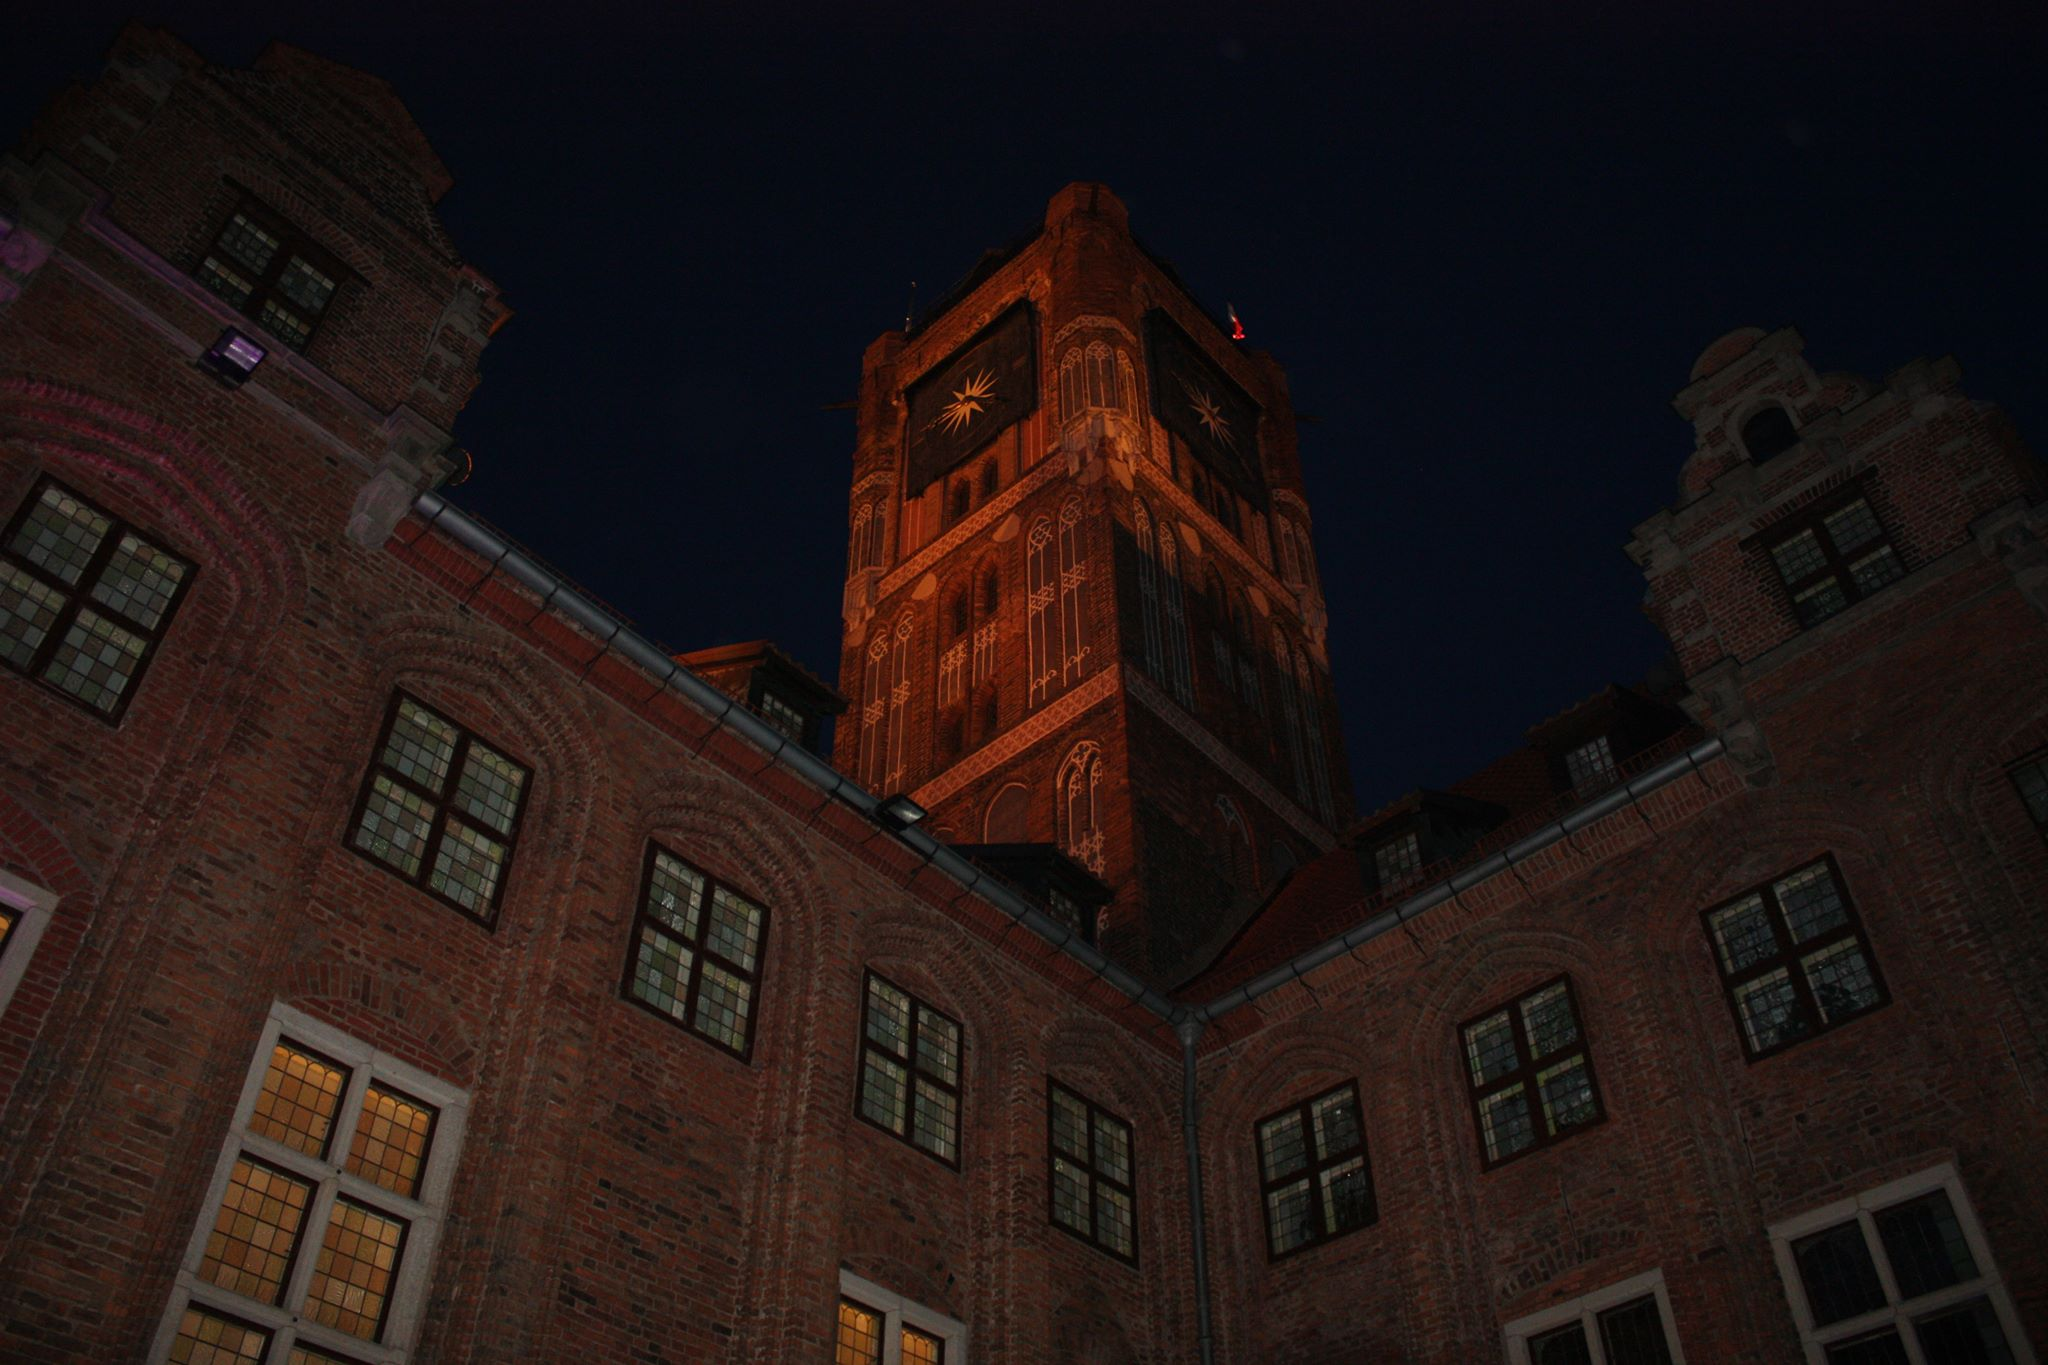 Wieża nocą, fot. h.smolarek